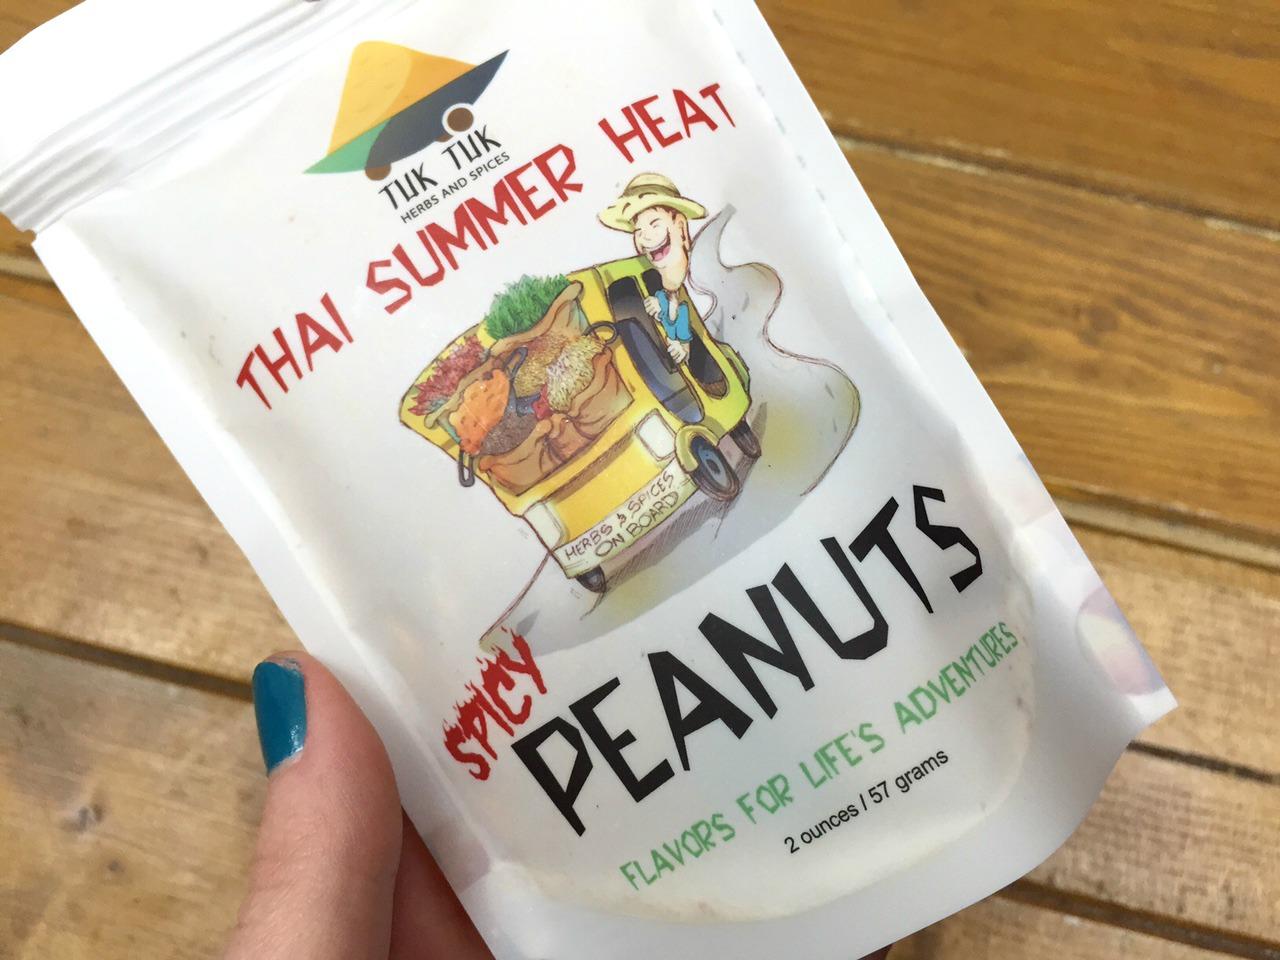 Tuk Tuk Thai Summer Heat Spicy Peanuts